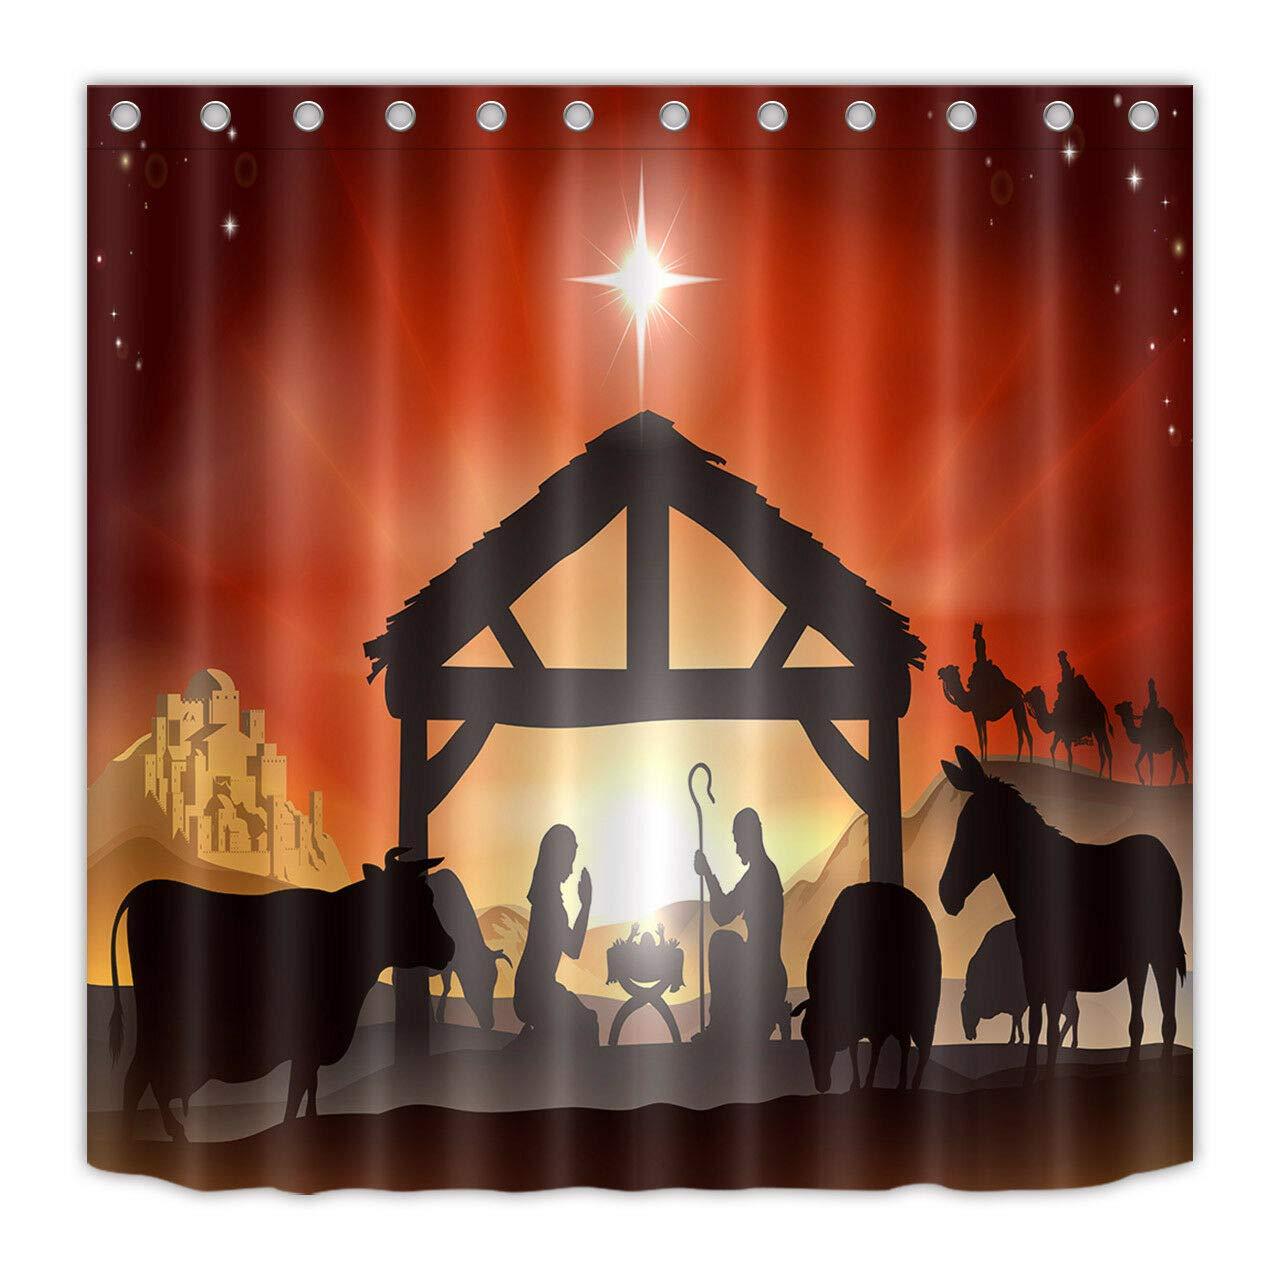 Waterproof Bathroom Shower Curtain Nativity of Jesus Scene Manger Three Kings